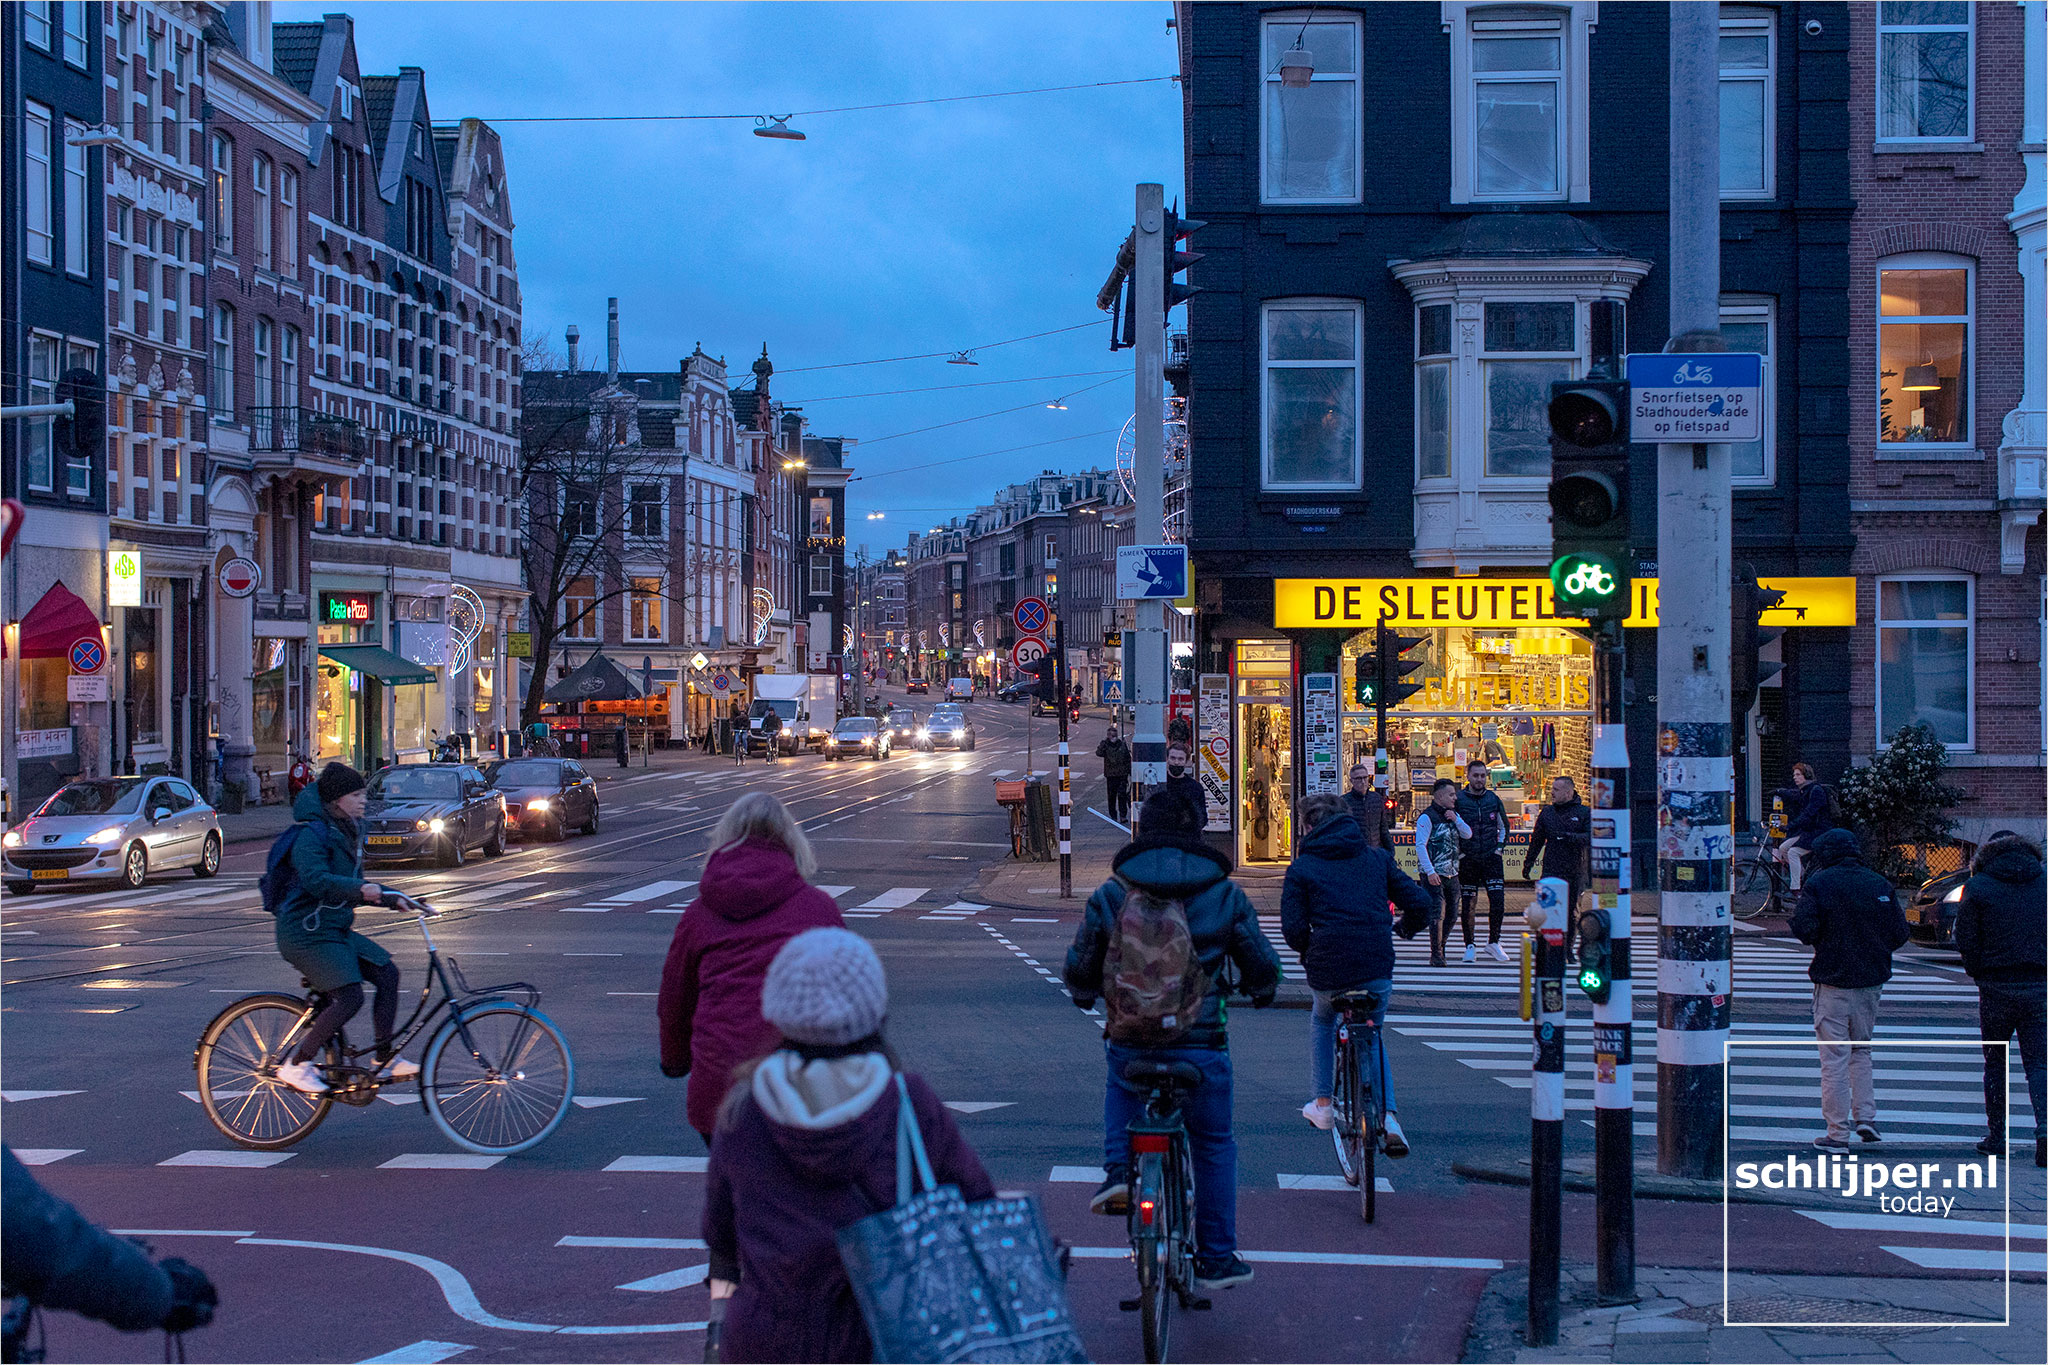 The Netherlands, Amsterdam, 18 januari 2021